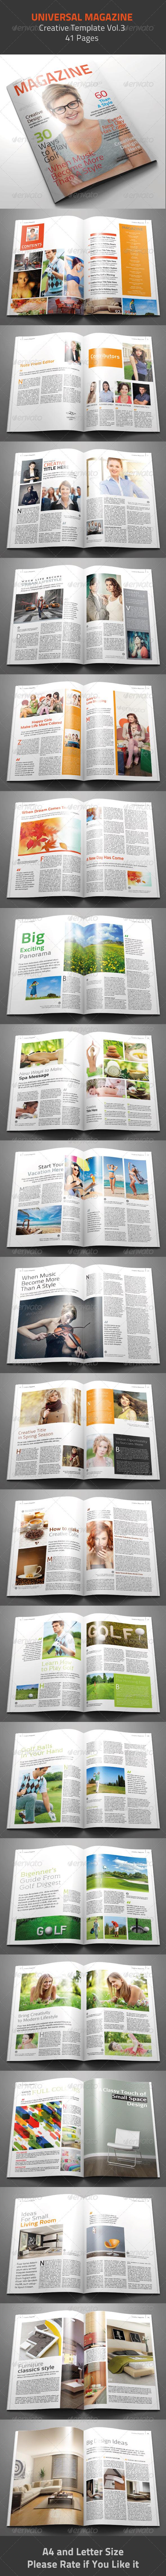 GraphicRiver Universal Magazine Template 4793470